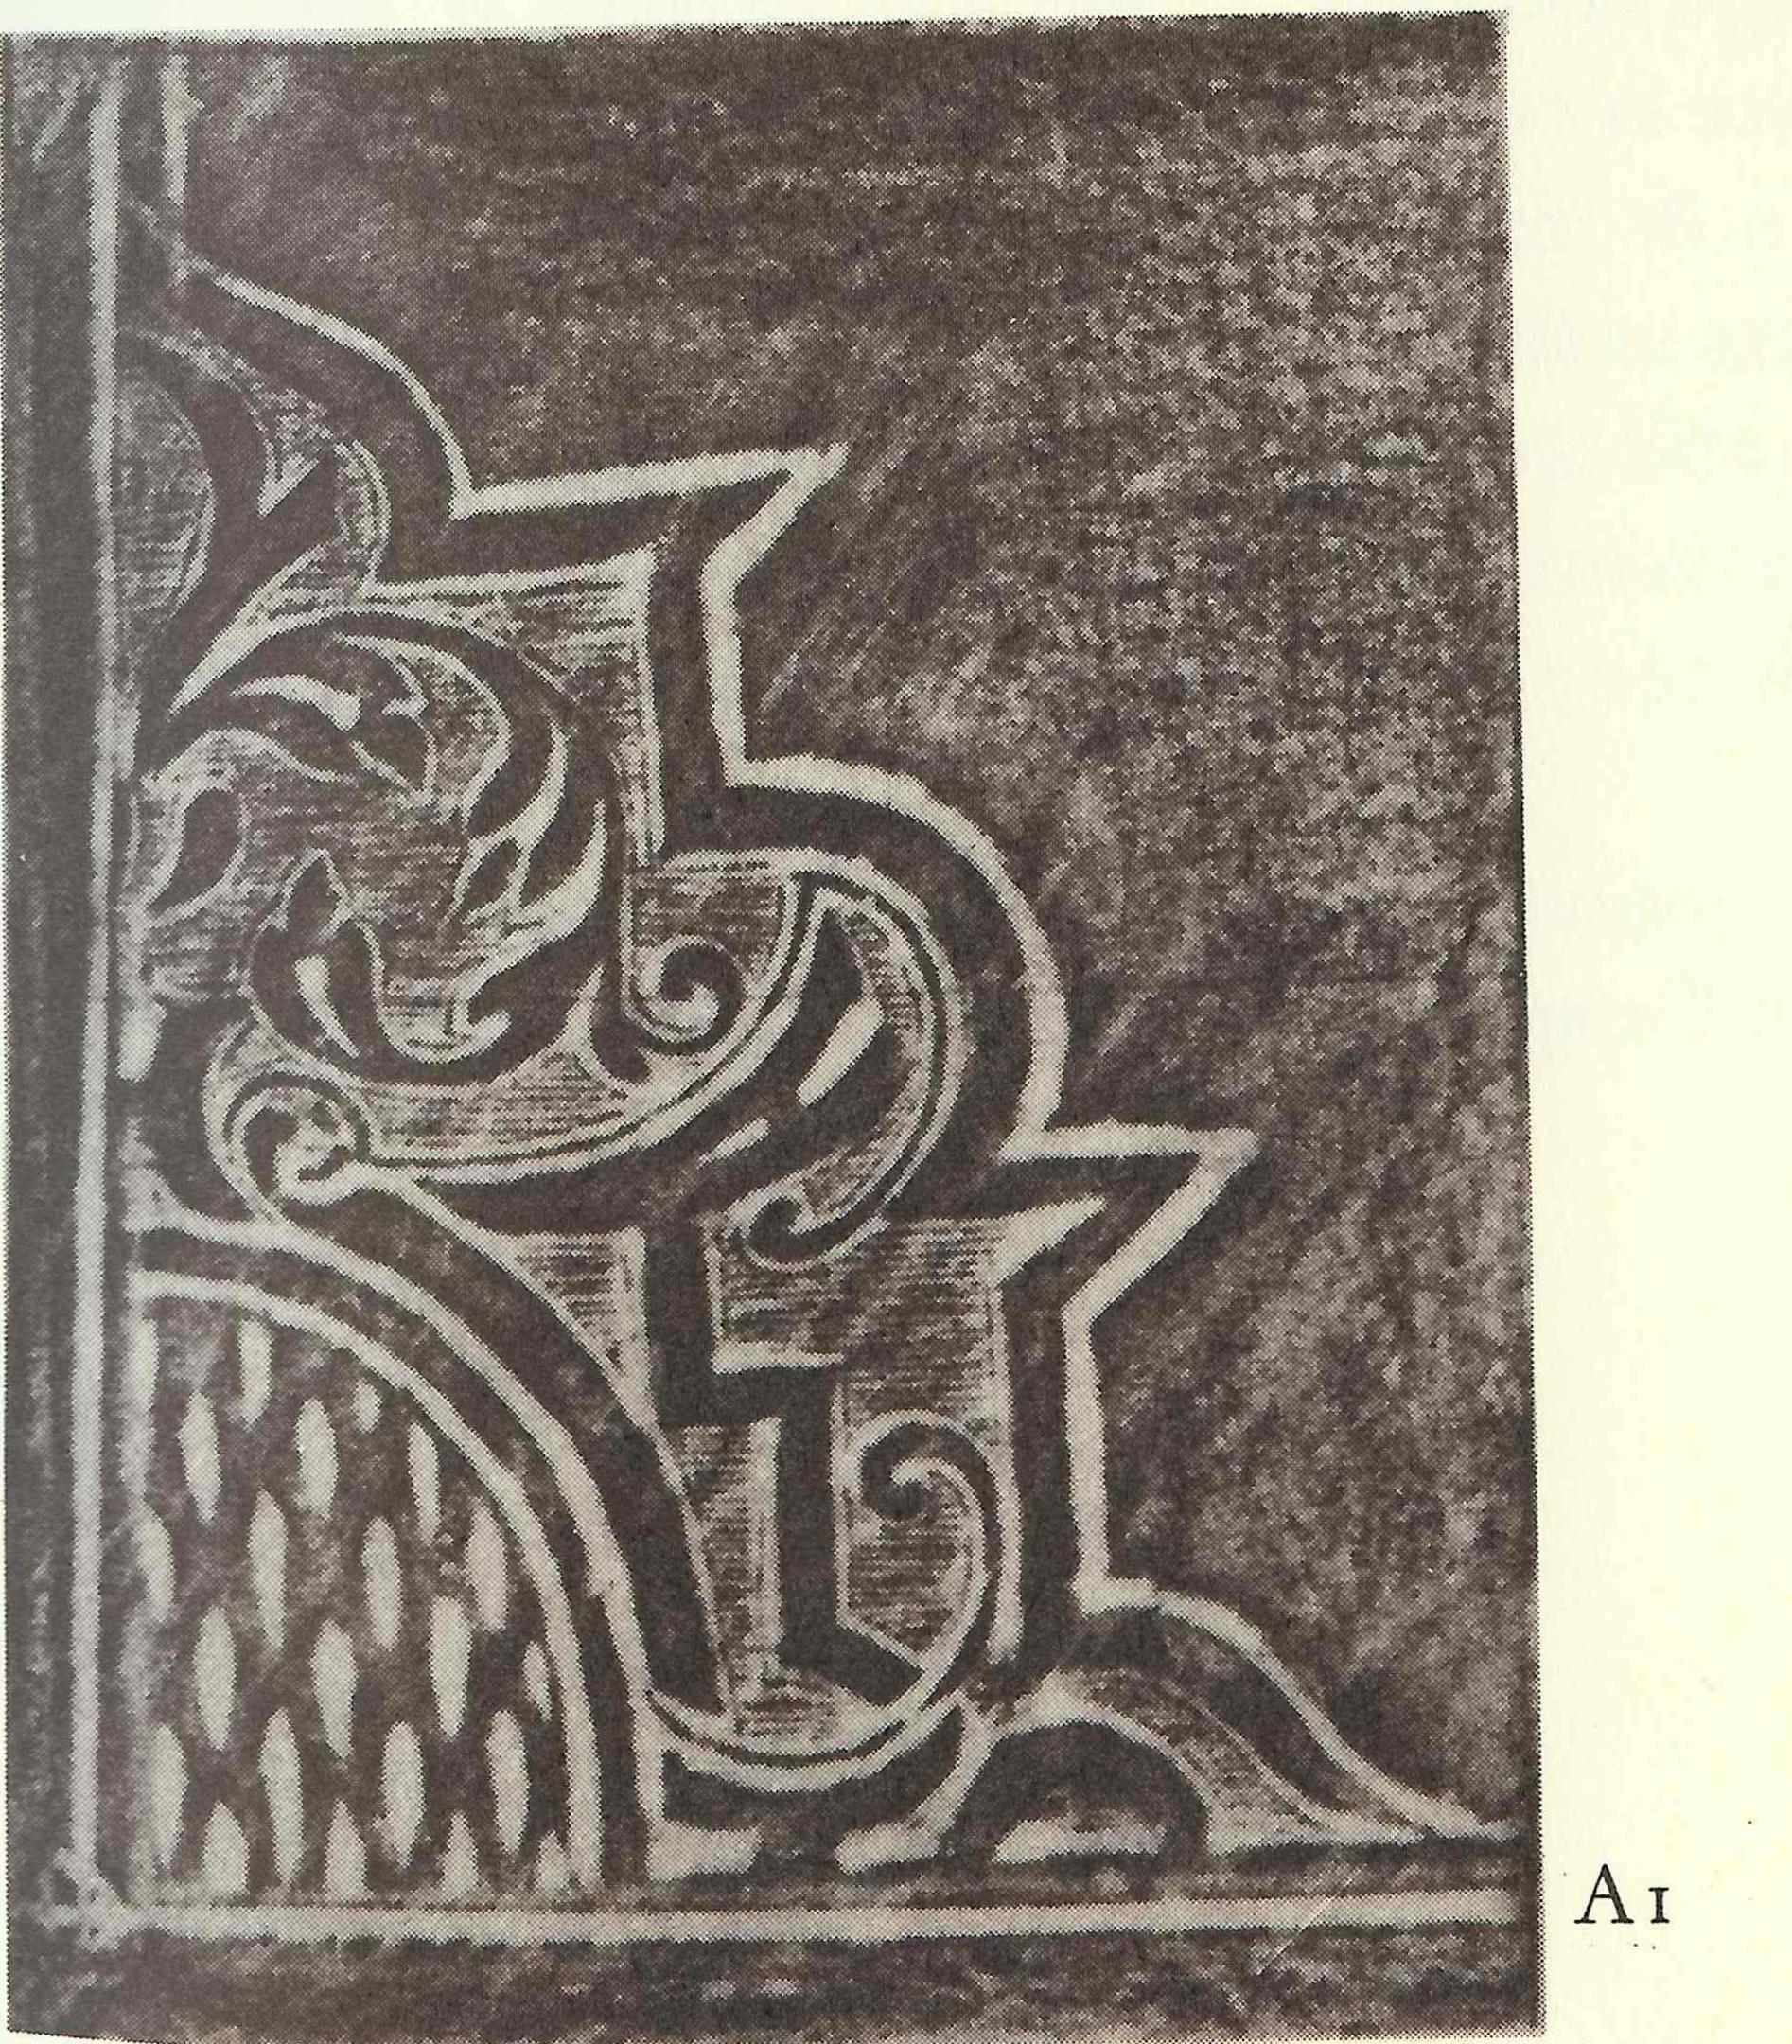 http://blogs.princeton.edu/rarebooks/images/1618_Adamson_A1.JPG